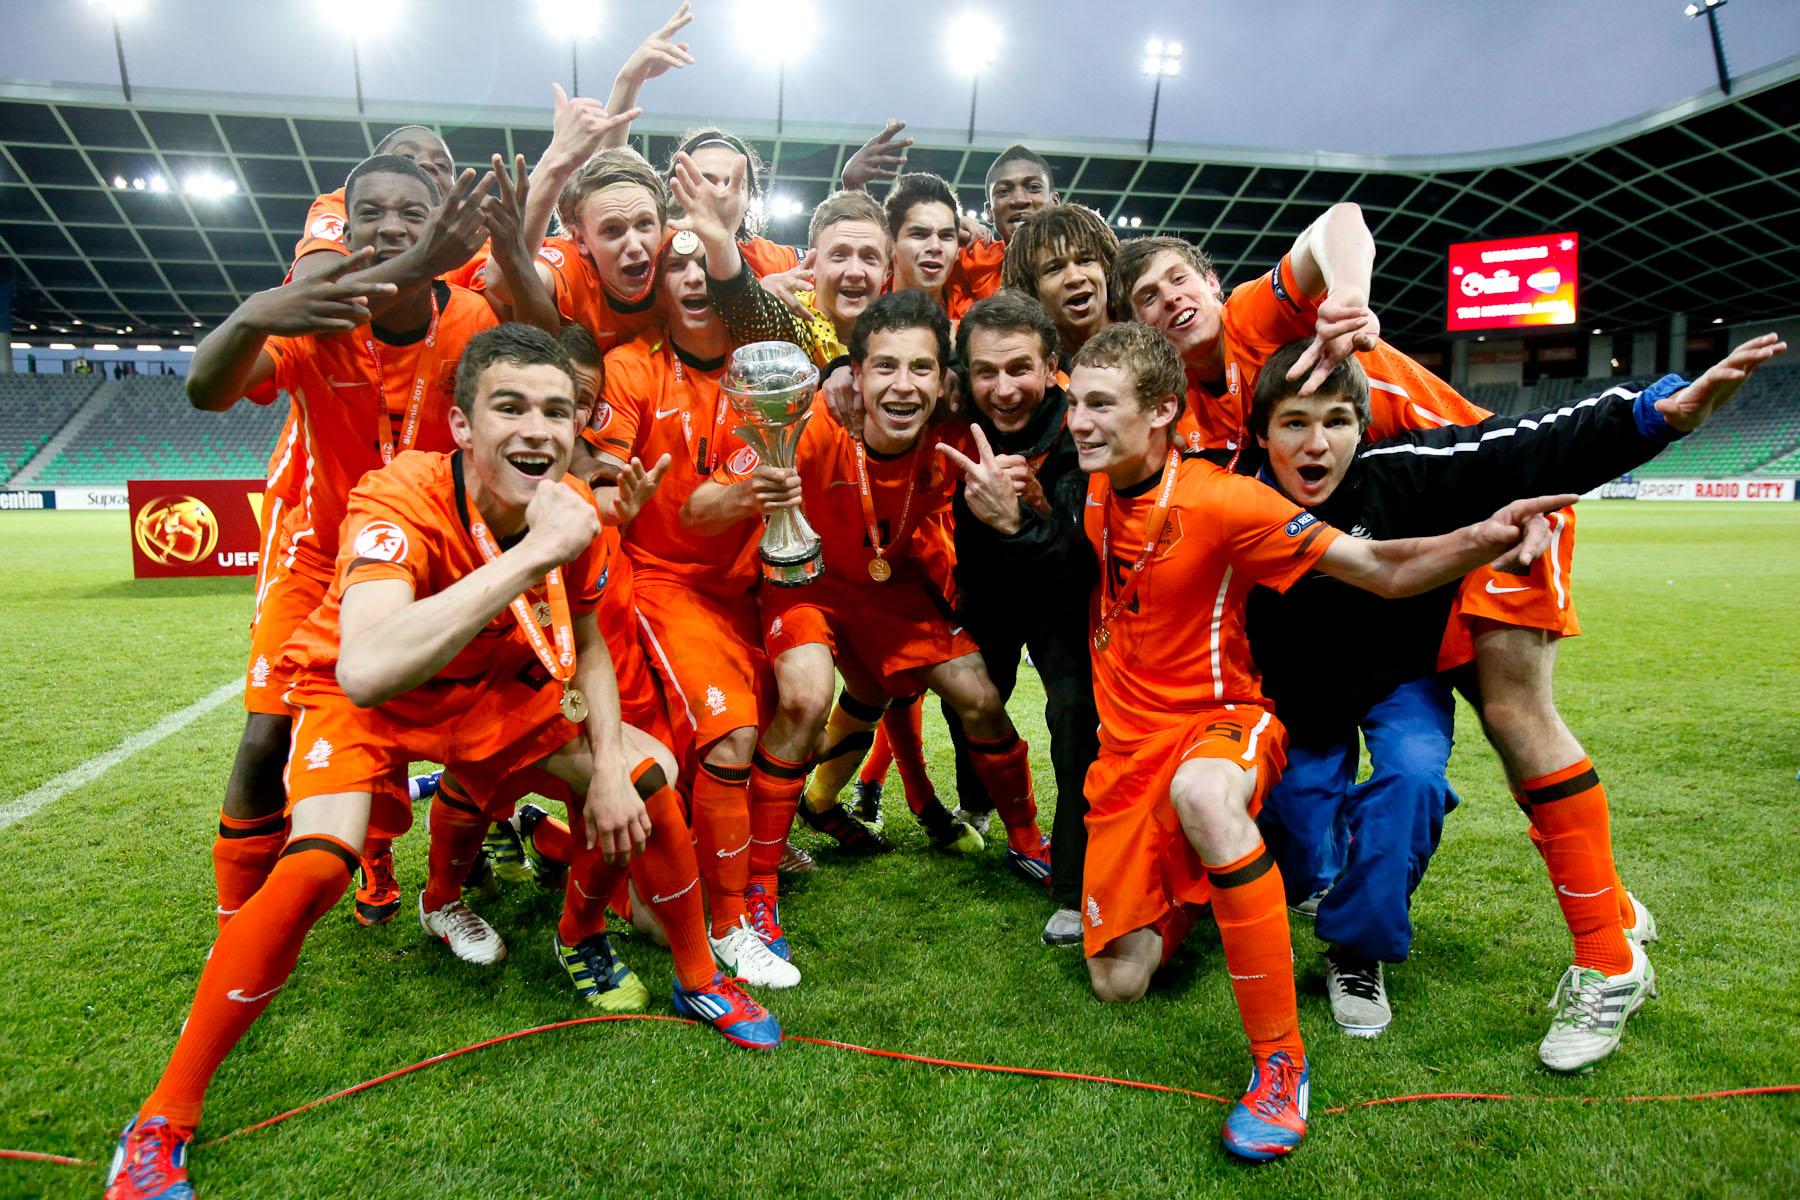 Team Netherlands celebrates winning the UEFA U-17 European Championship finals at the SRC Stozice Stadium in Ljubljana, Slovenia, May 16, 2012.